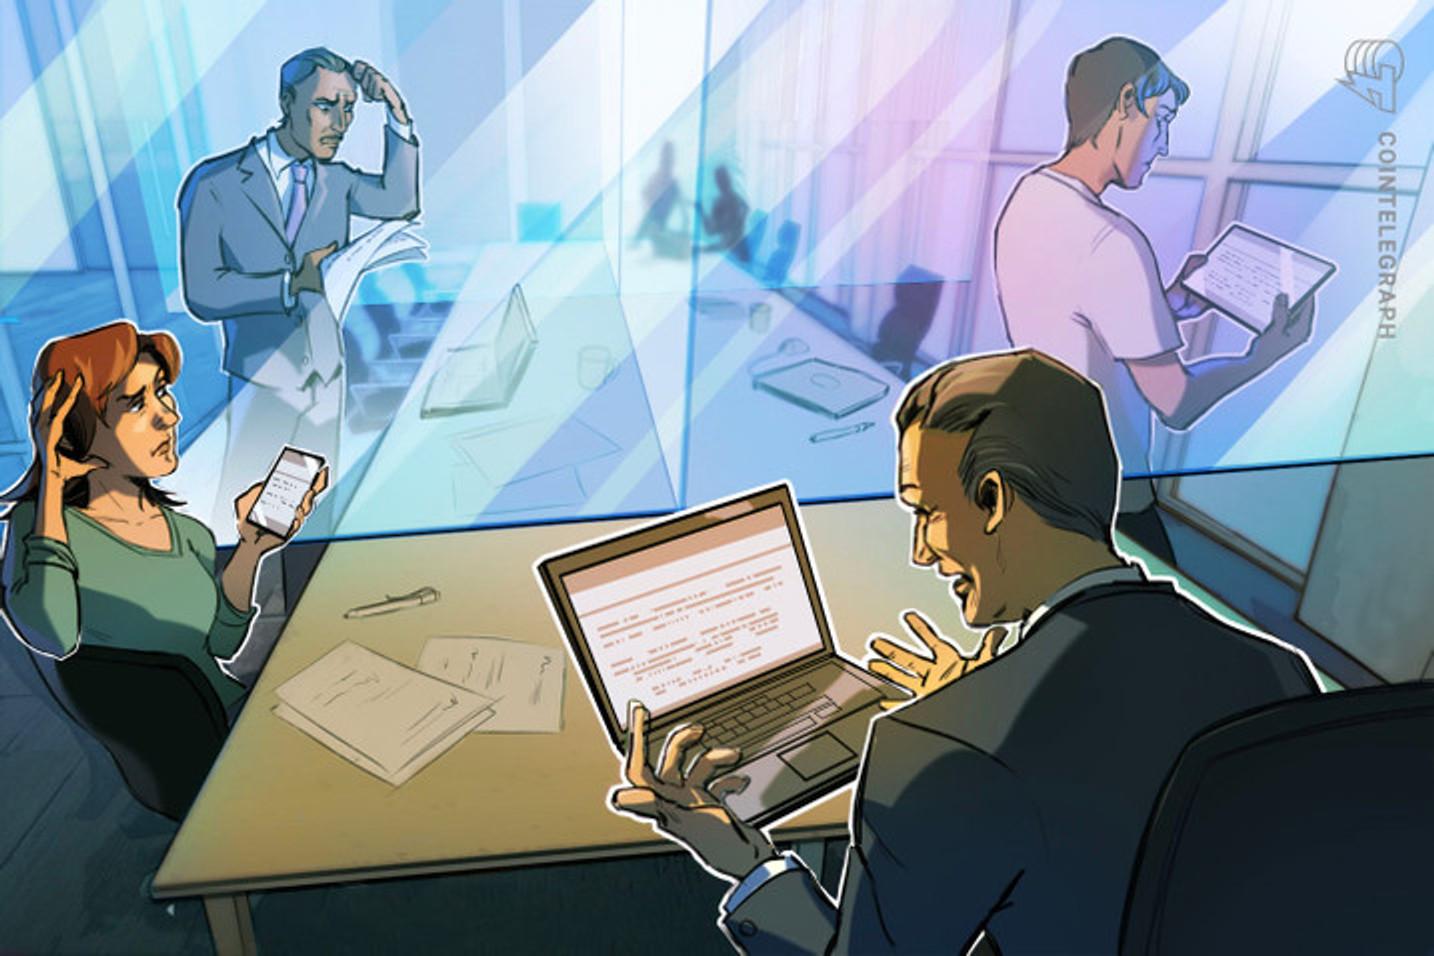 SMBCモビット5つの返済方法|返済額の確認や遅れた時の対処法も解説